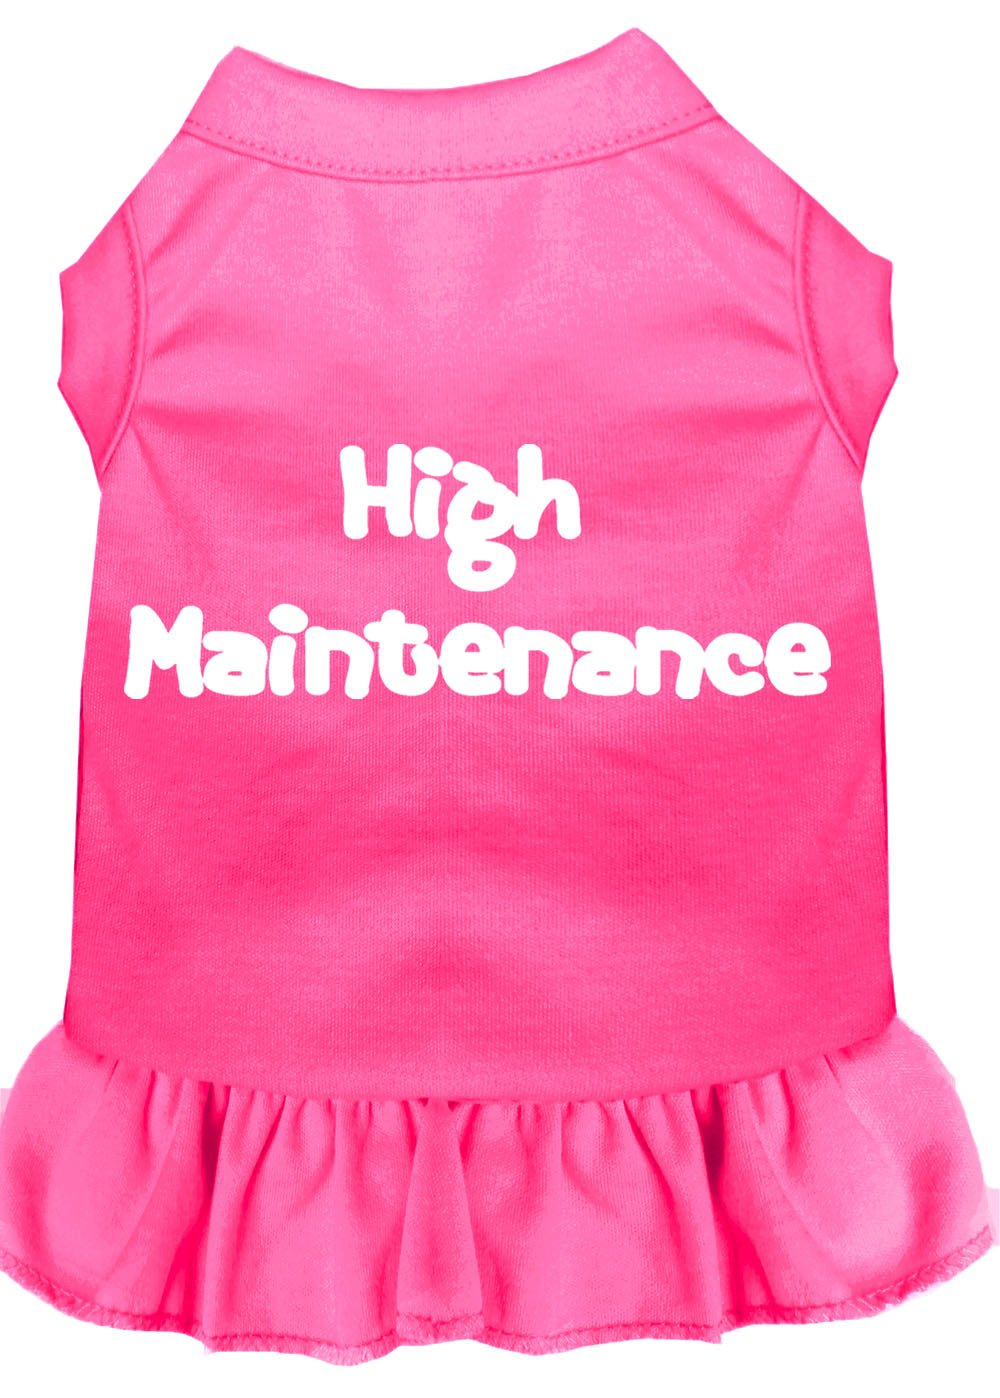 Mirage Pet Products 58-06 XXXLBPK Pink High Maintenance Screen Print Dress Bright, 3X-Large